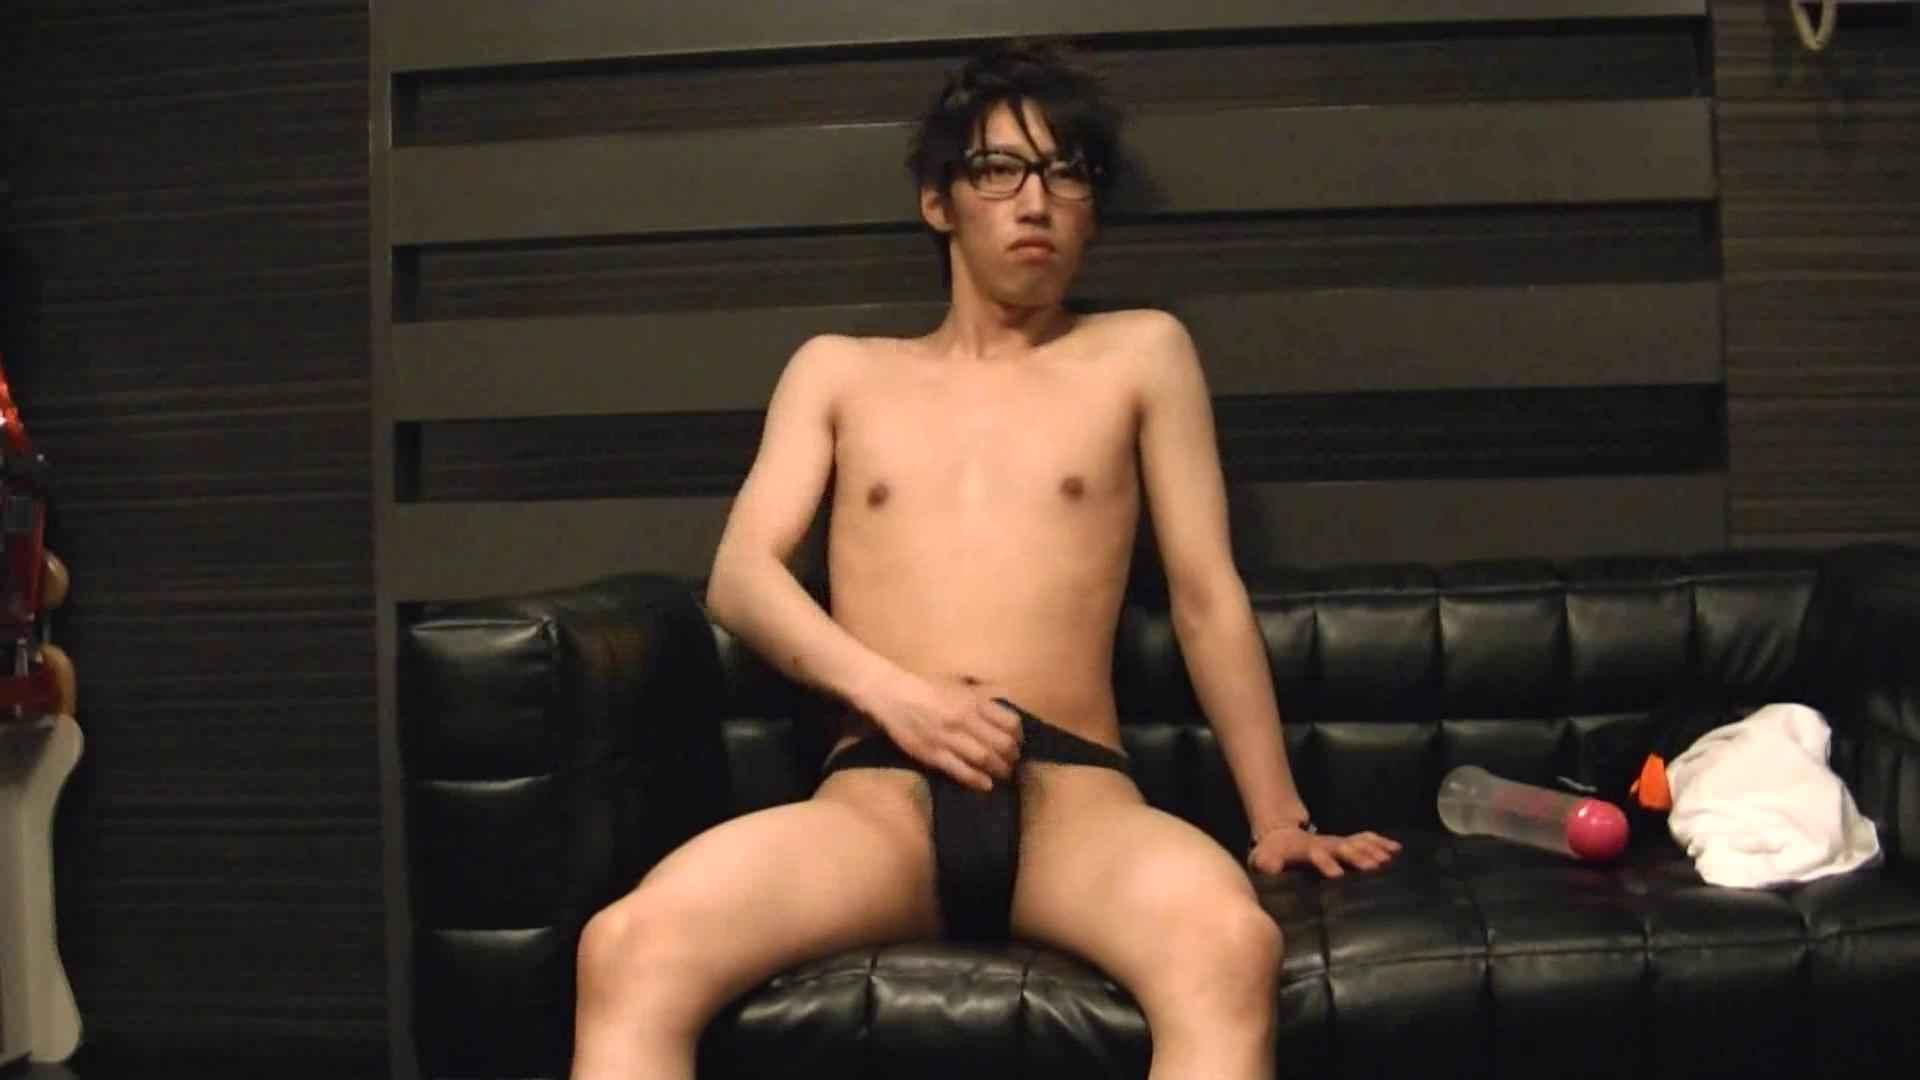 ONA見せカーニバル!! Vol3 男 ゲイ無料無修正画像 89枚 30